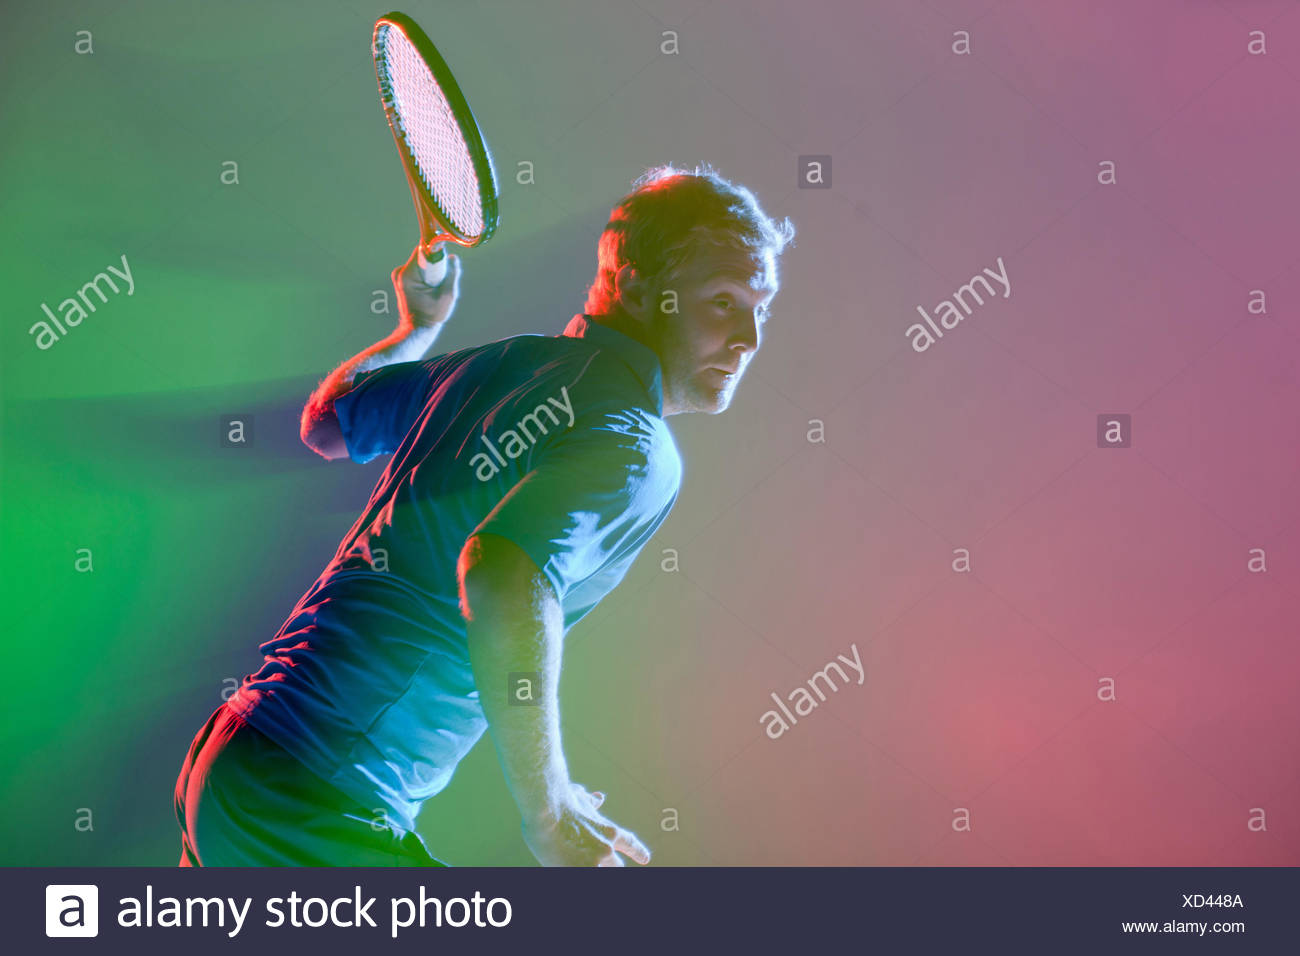 Jugador de tenis raqueta oscilante Imagen De Stock